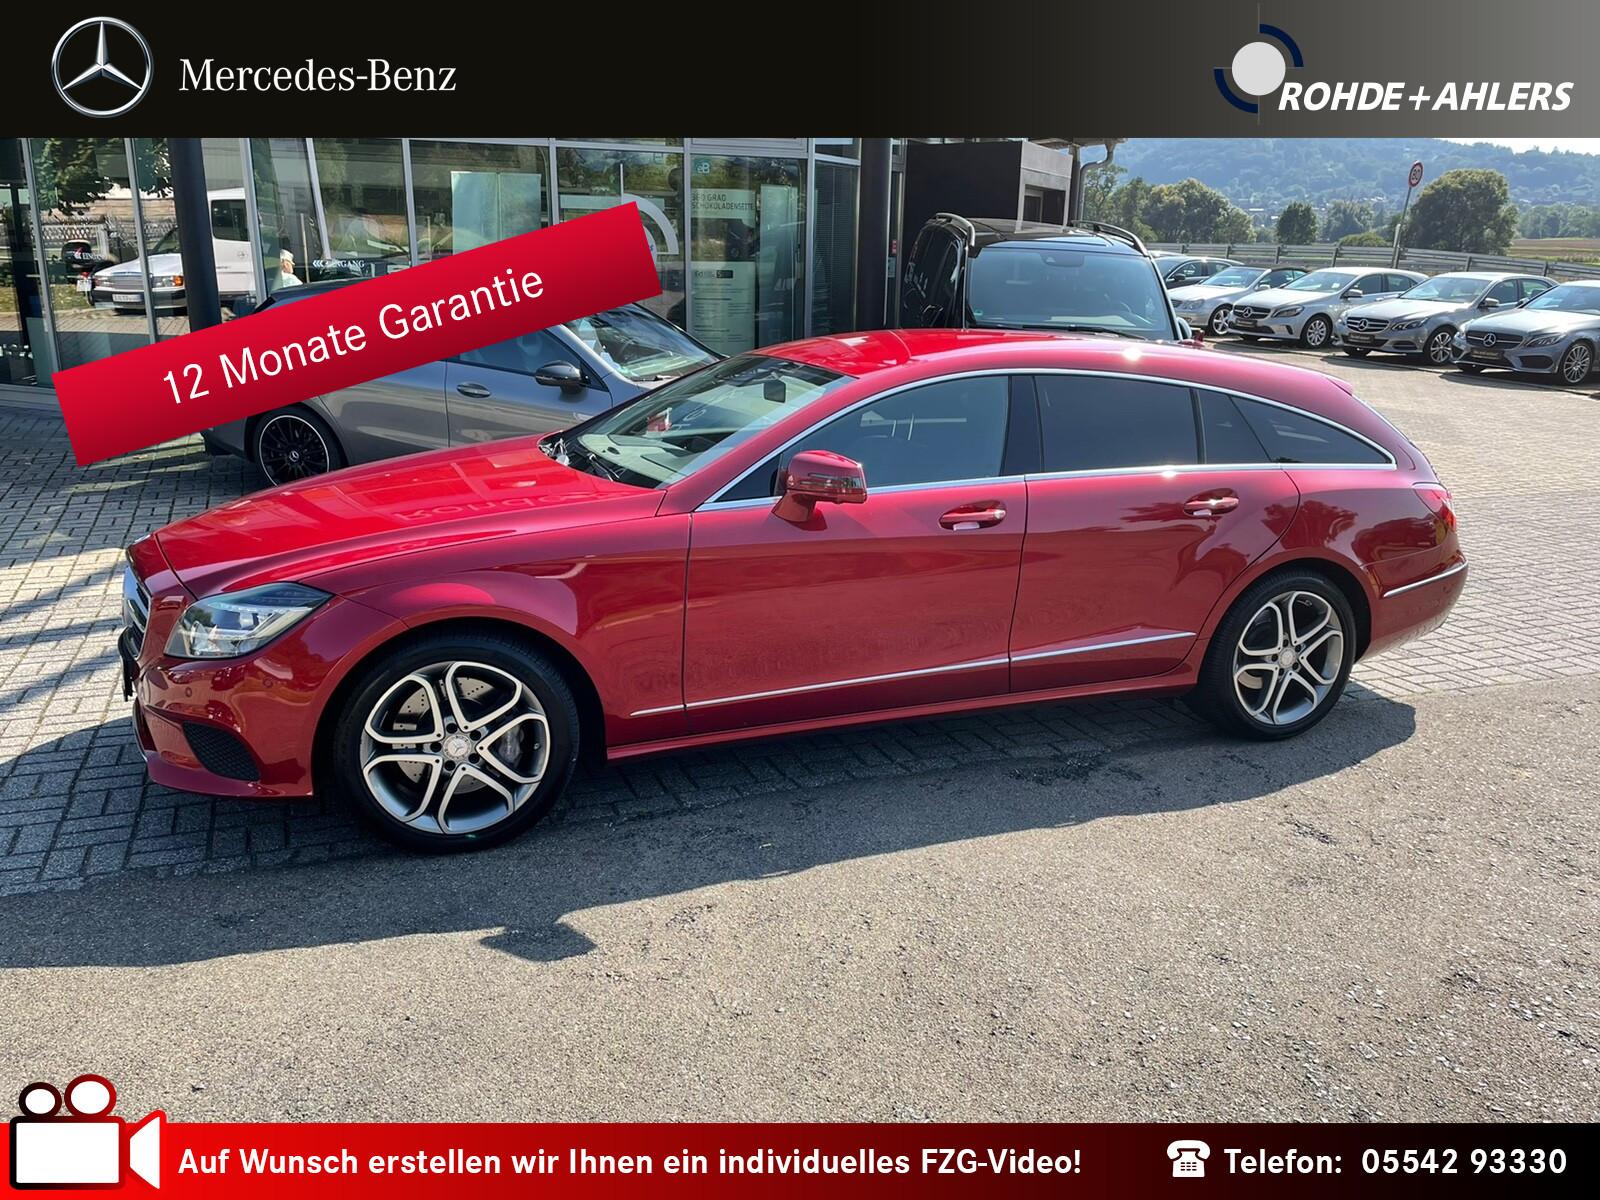 Mercedes-Benz CLS 350 SB BT 4M NAVI+DISTRONIK+LED ILS+AHK+MEMO, Jahr 2014, Diesel